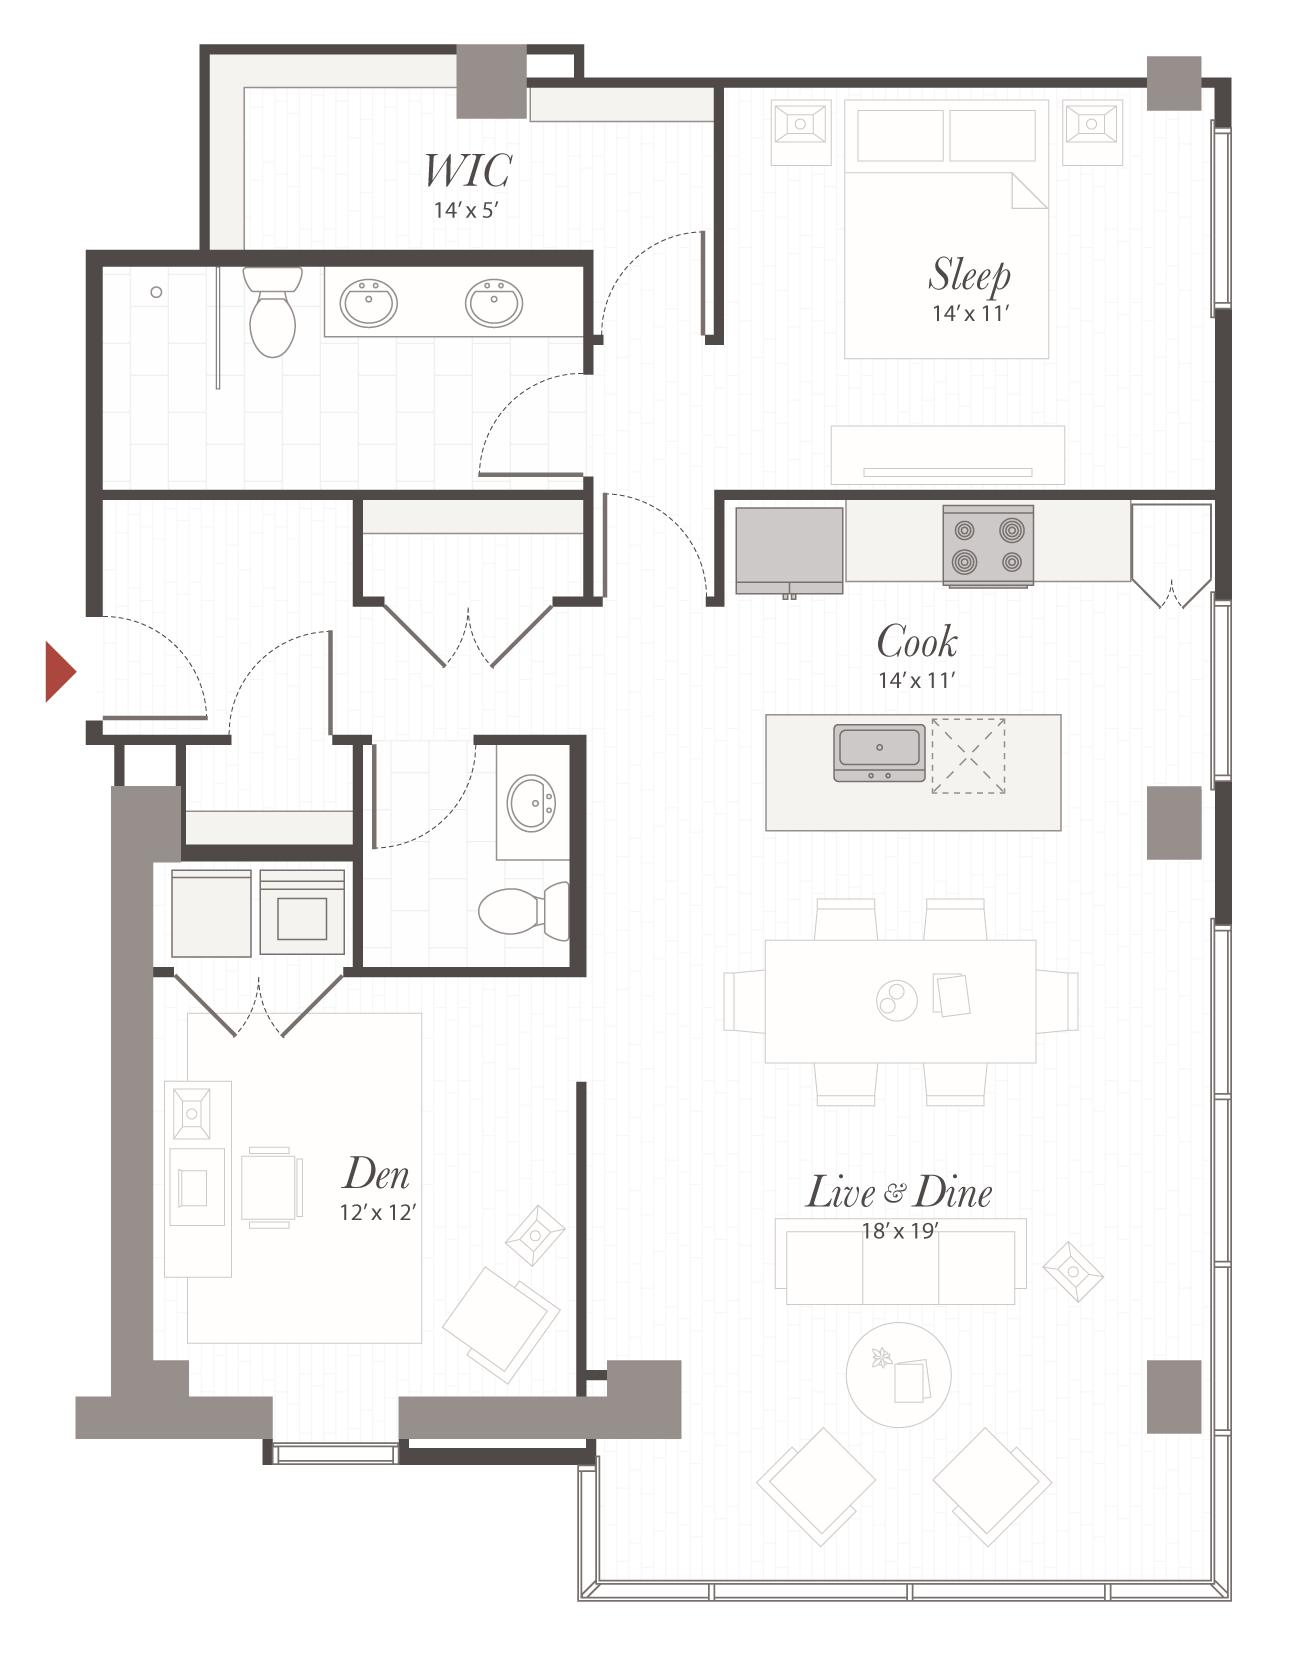 P11 1 Bedroom Apartment Cincinnati Encore Apartments